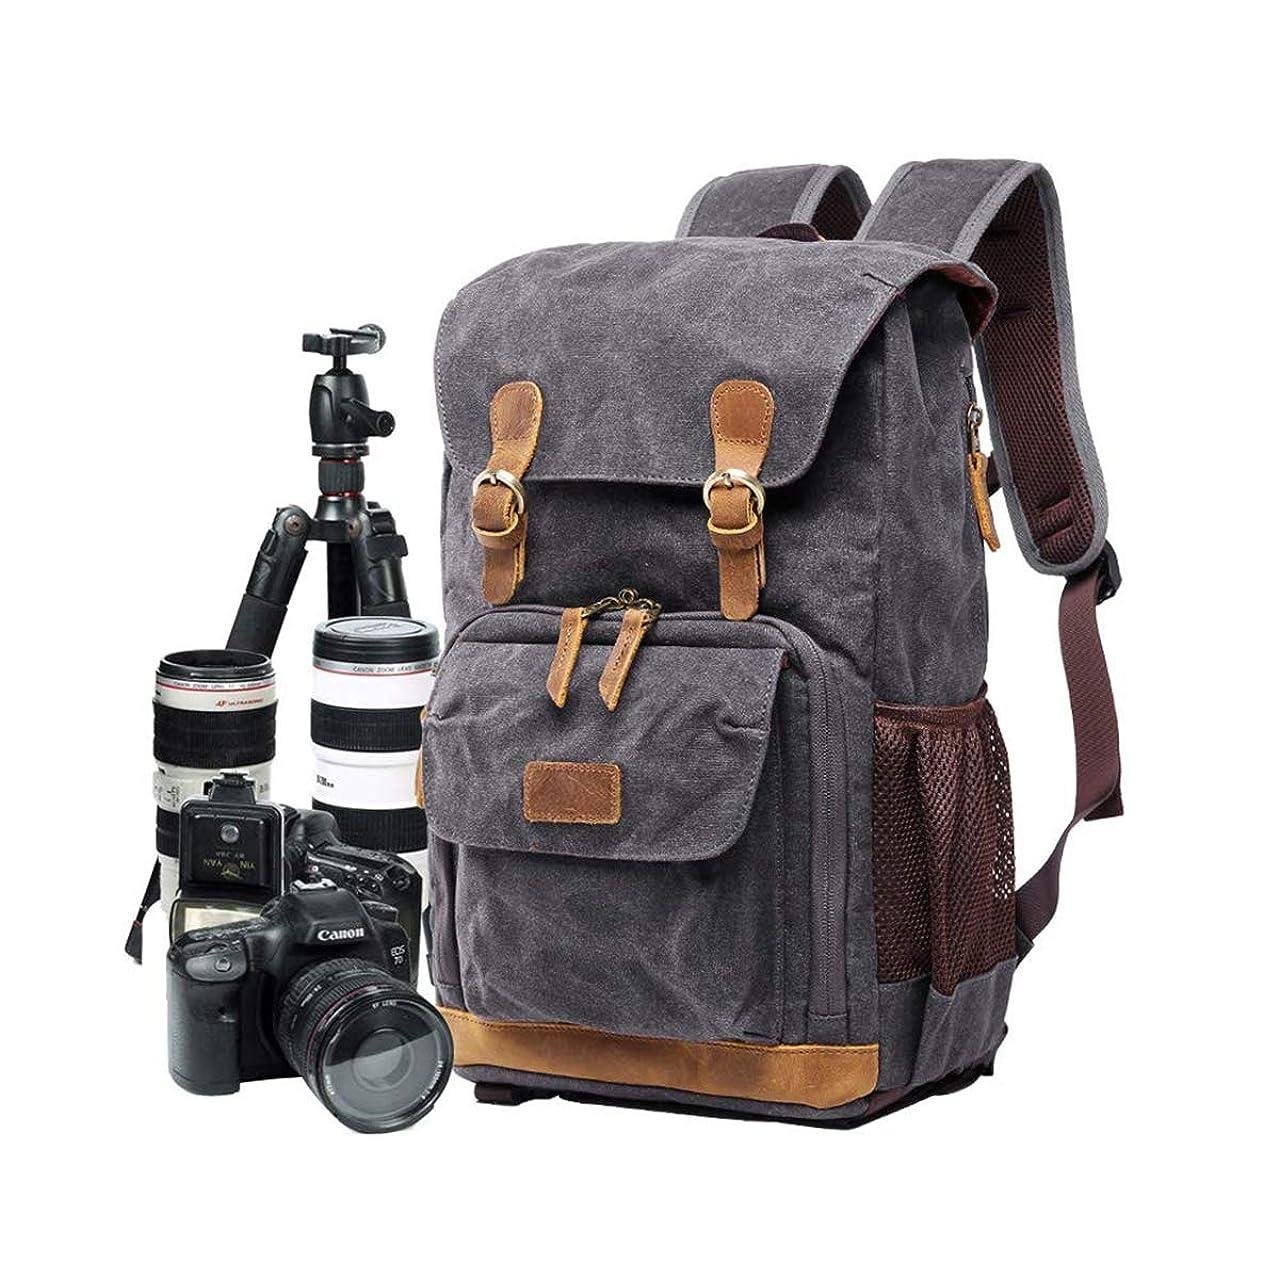 AHWZ Camera Bag, Canvas SLR DSLR Camera Backpack Large Capacity Front Open Waterproof Anti-Shock Camera Rucksack Camera Travel Bag Professional Camera Lens Organizer